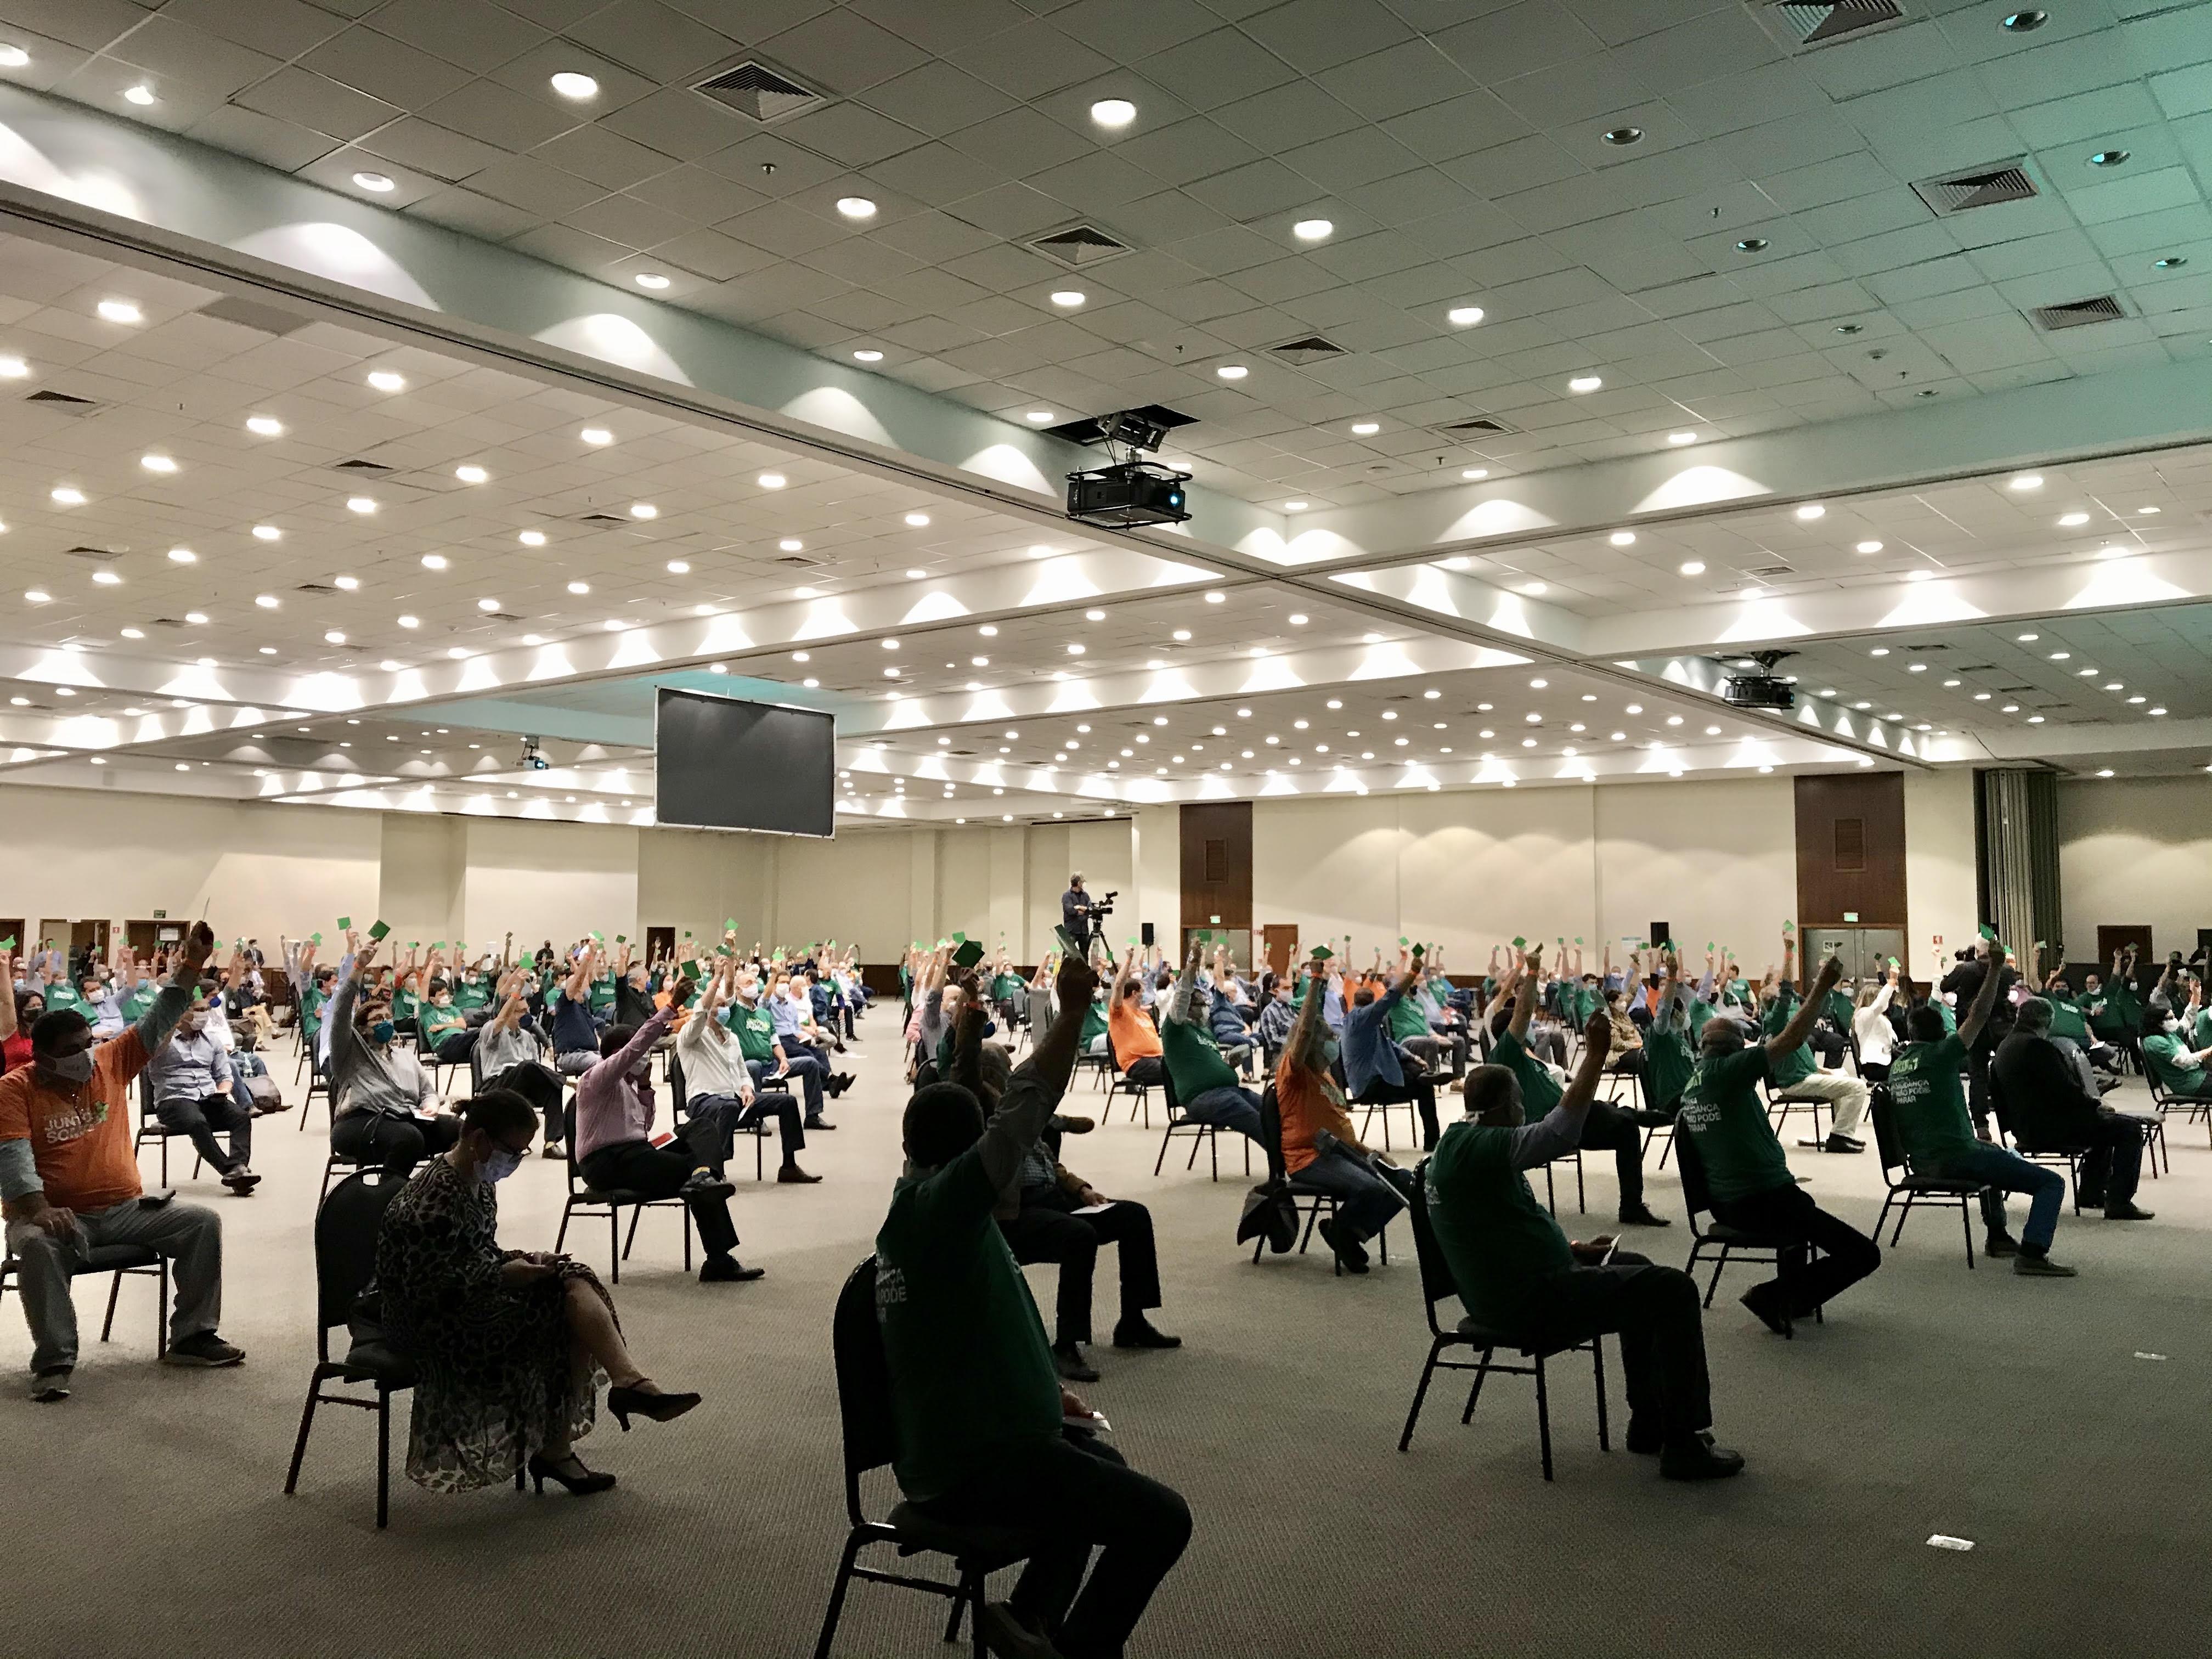 Unimed-RJ - Assembléia 2